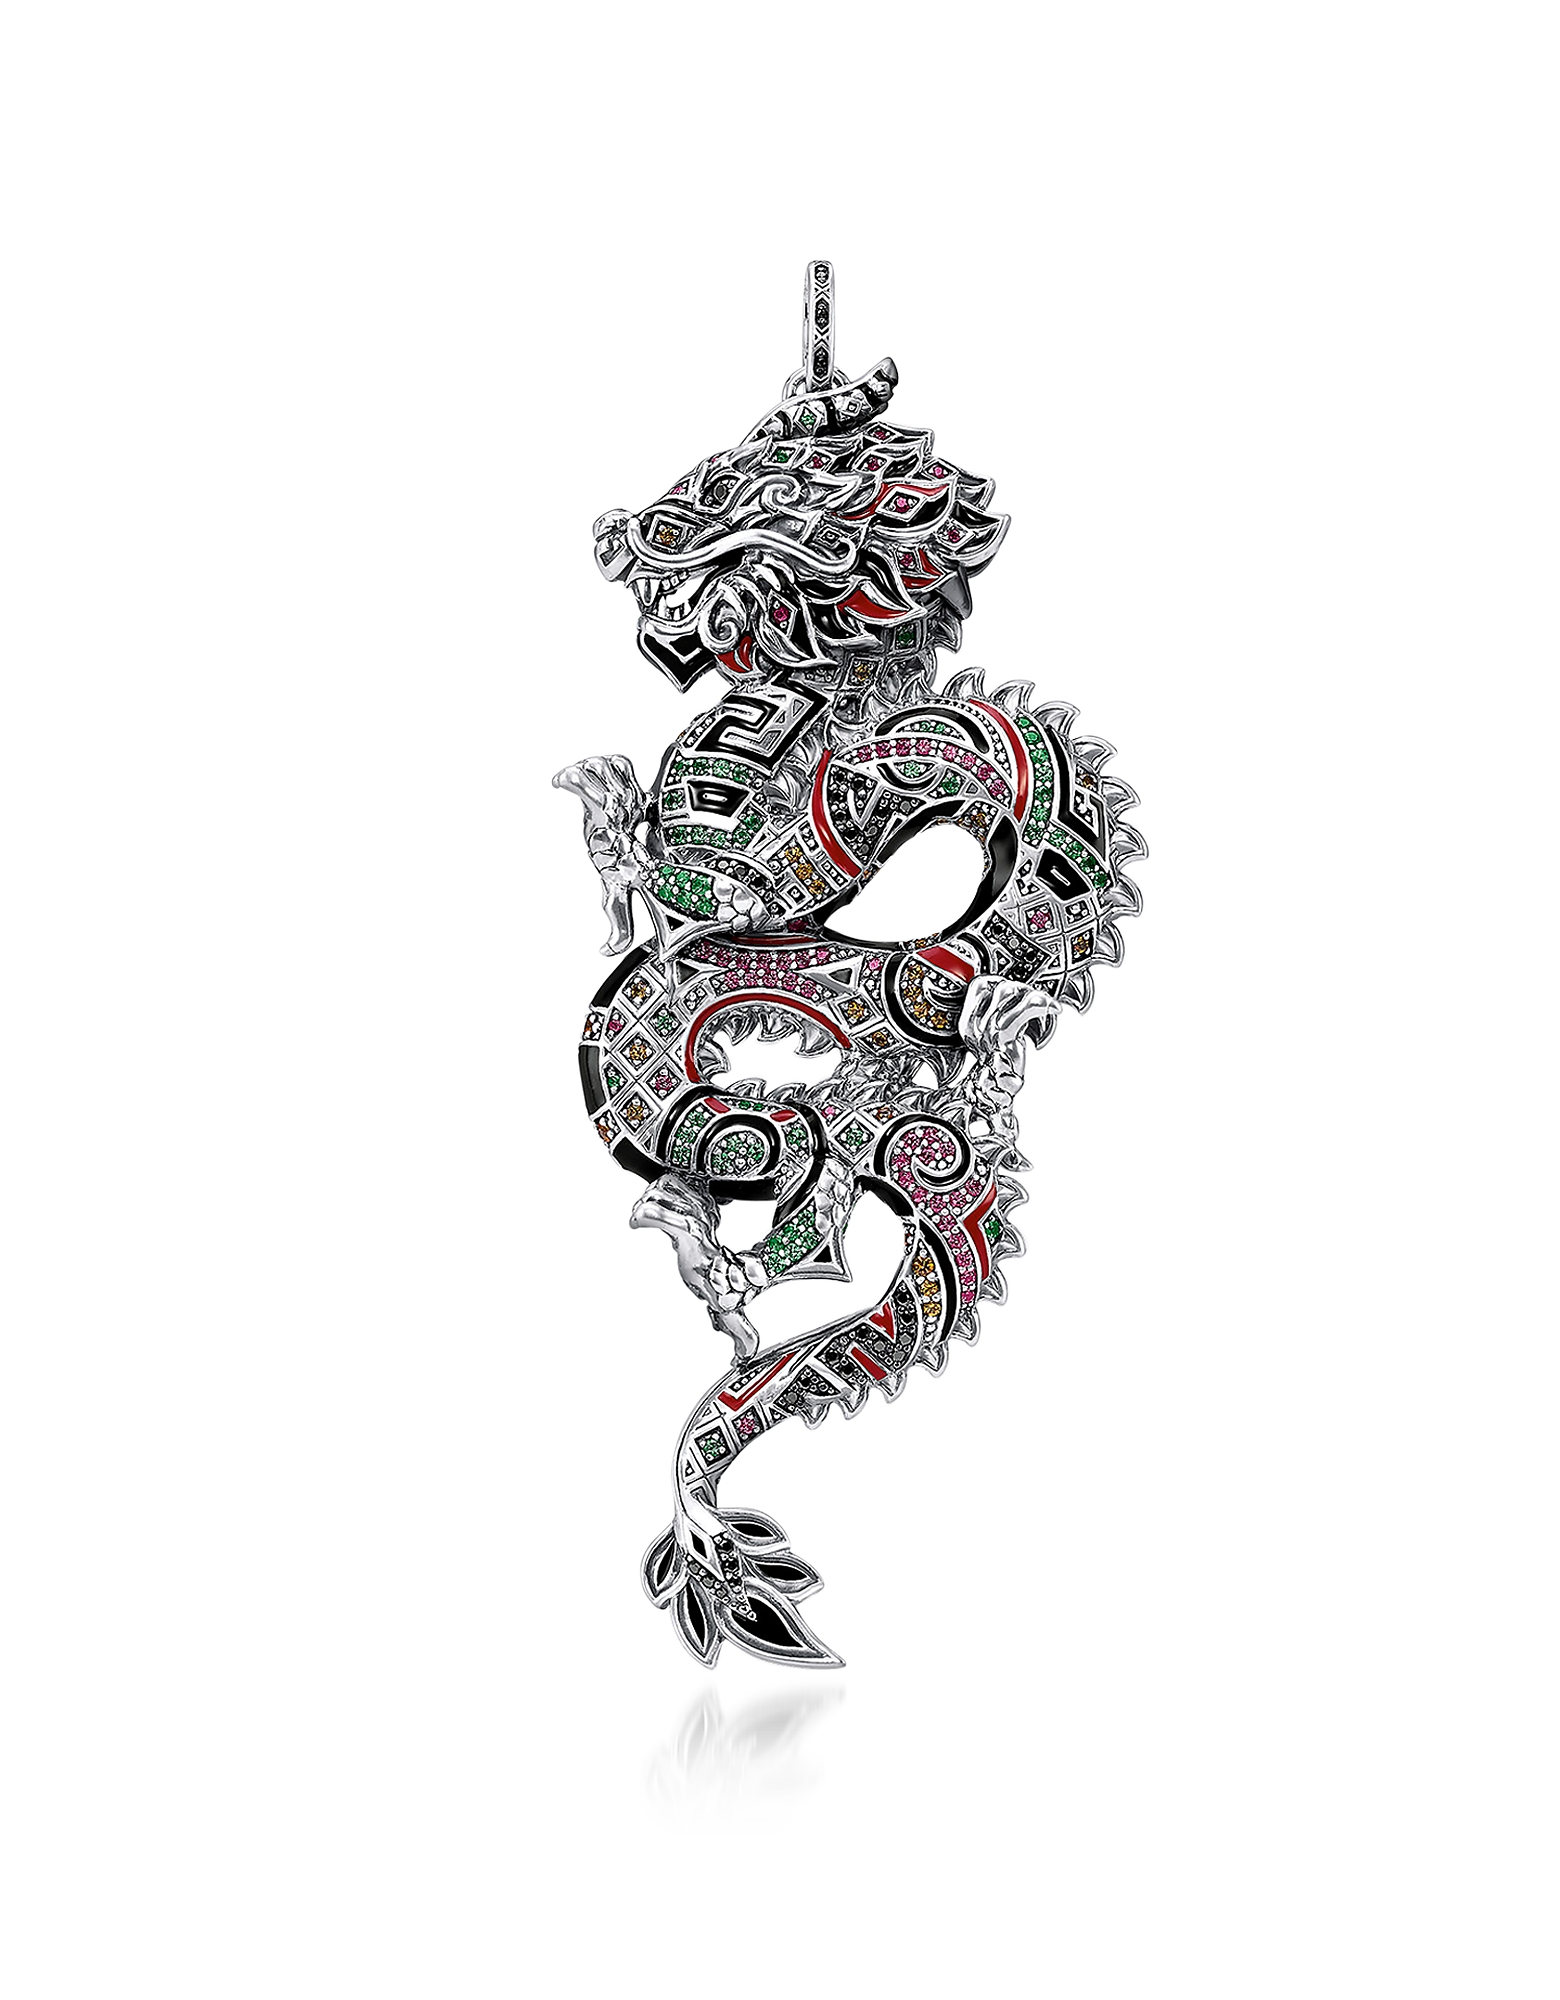 Thomas Sabo Necklaces, Blackened Sterling Silver, Enamel and Glass-ceramic Stones Medium Chinese Dra